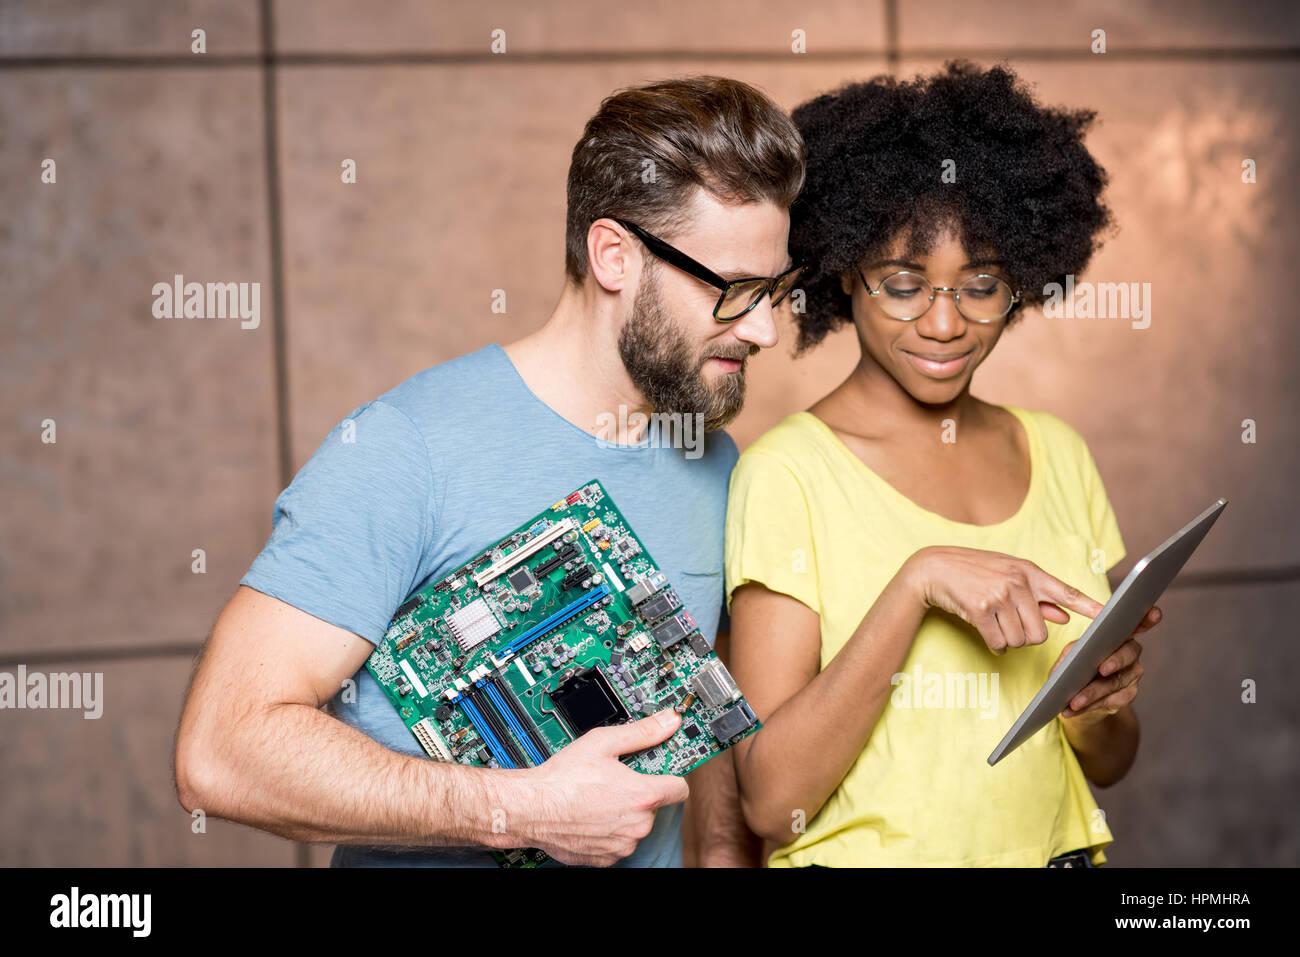 Programmierer mit Computer-motherboard Stockbild